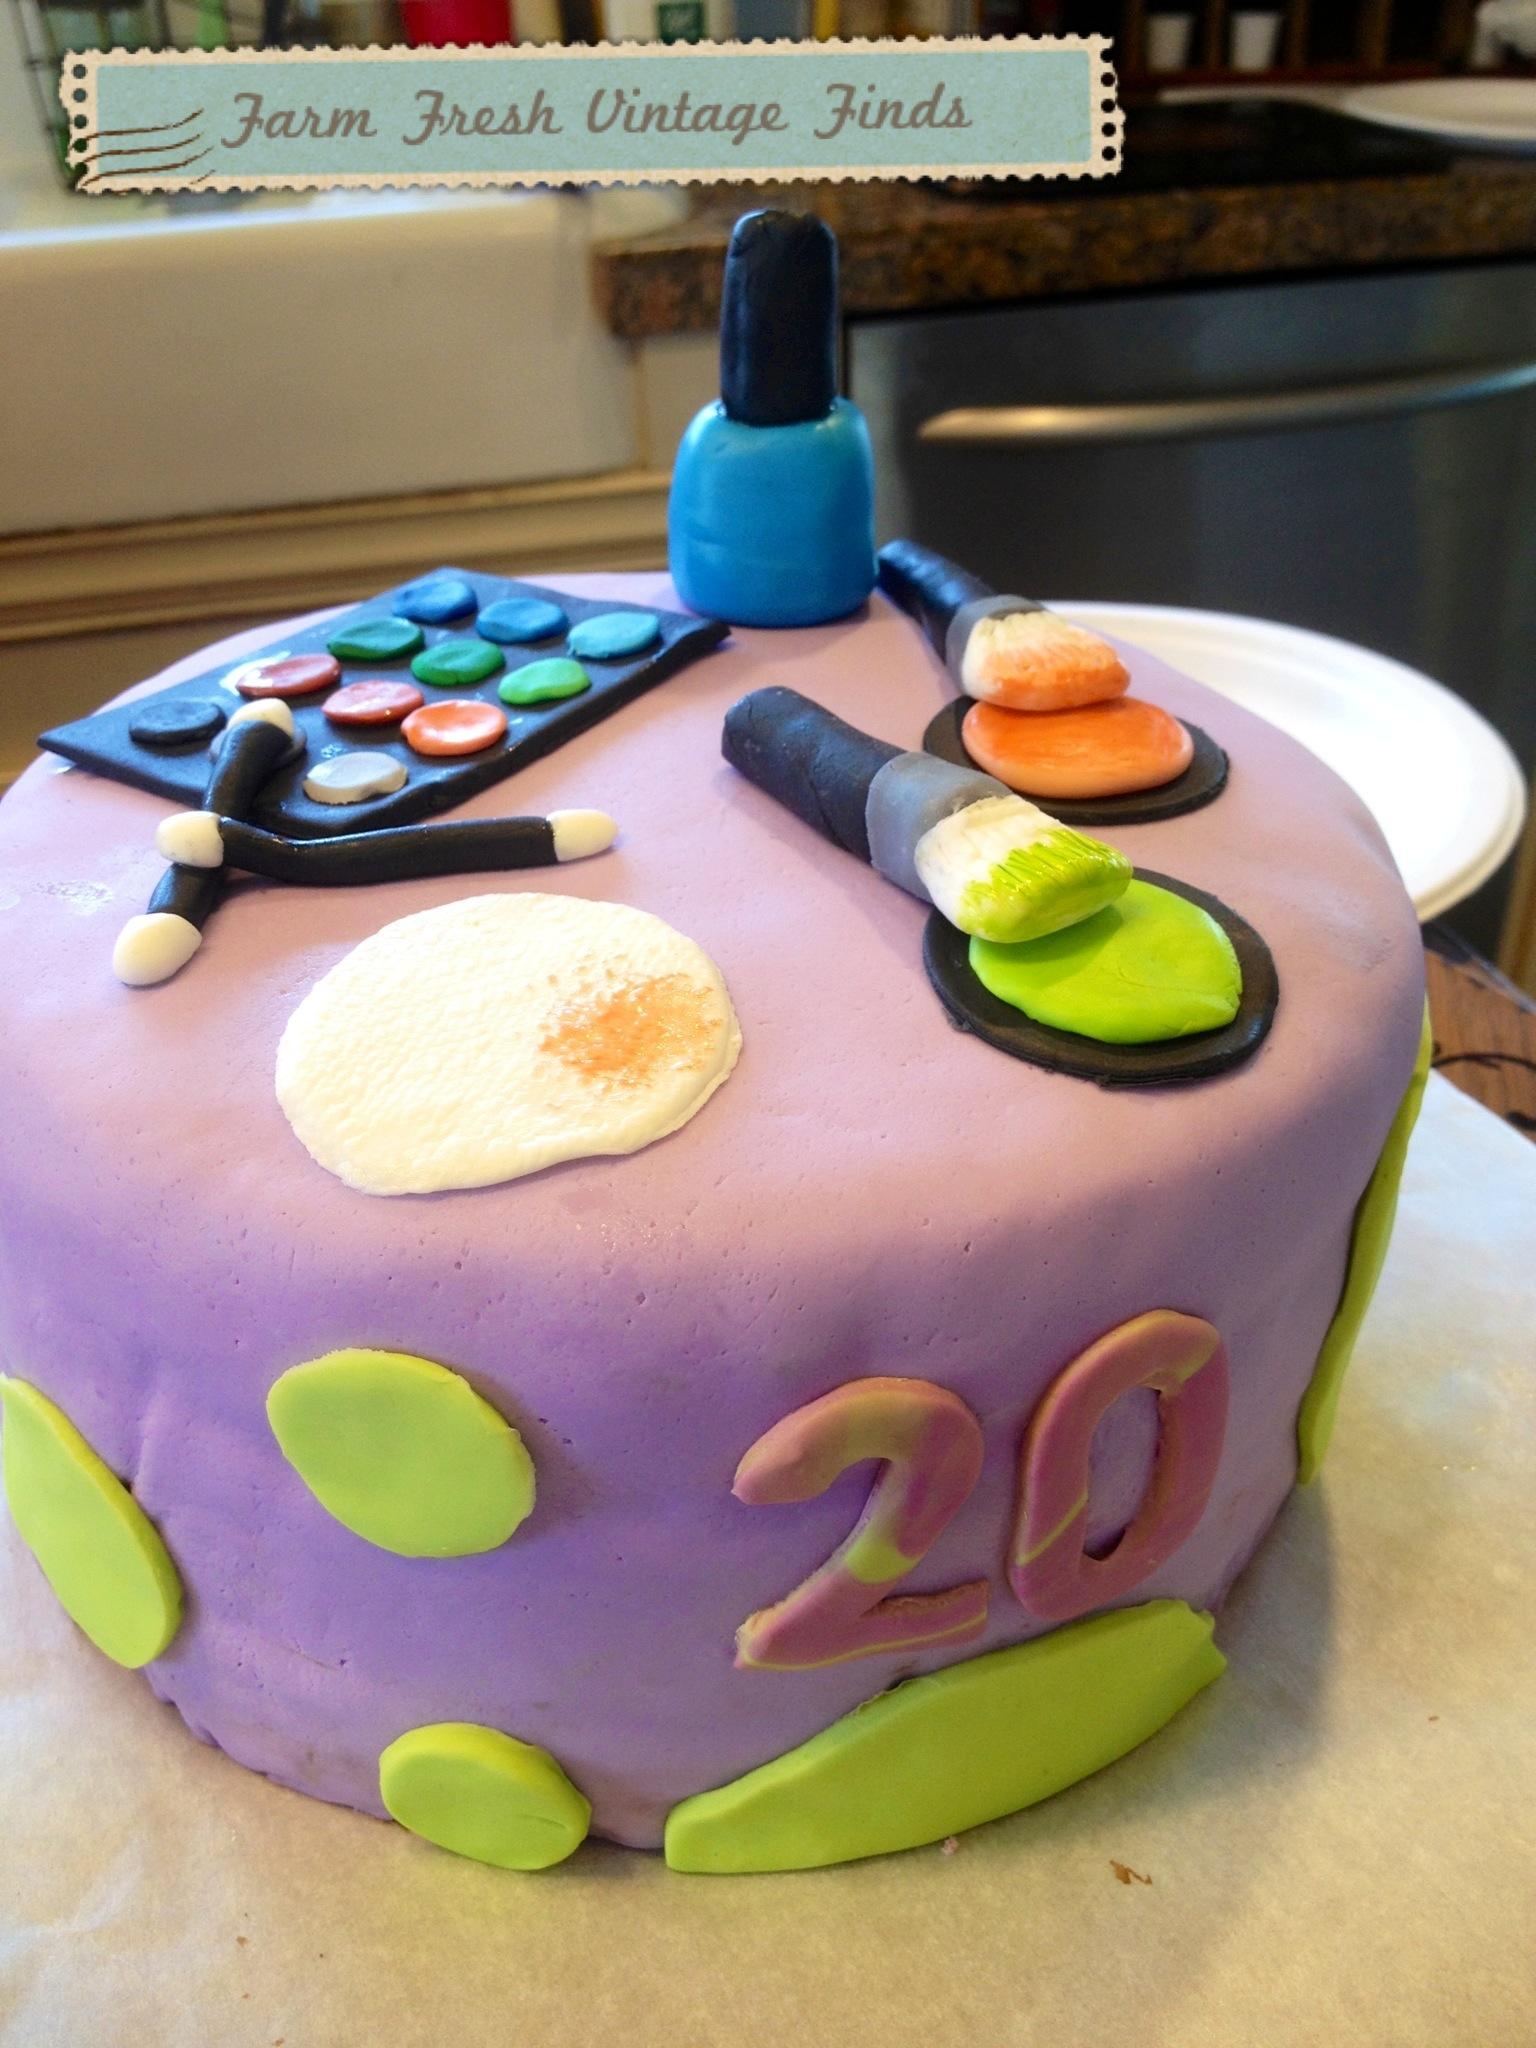 Make Up Themed Birthday Cake Farm Fresh Vintage Finds